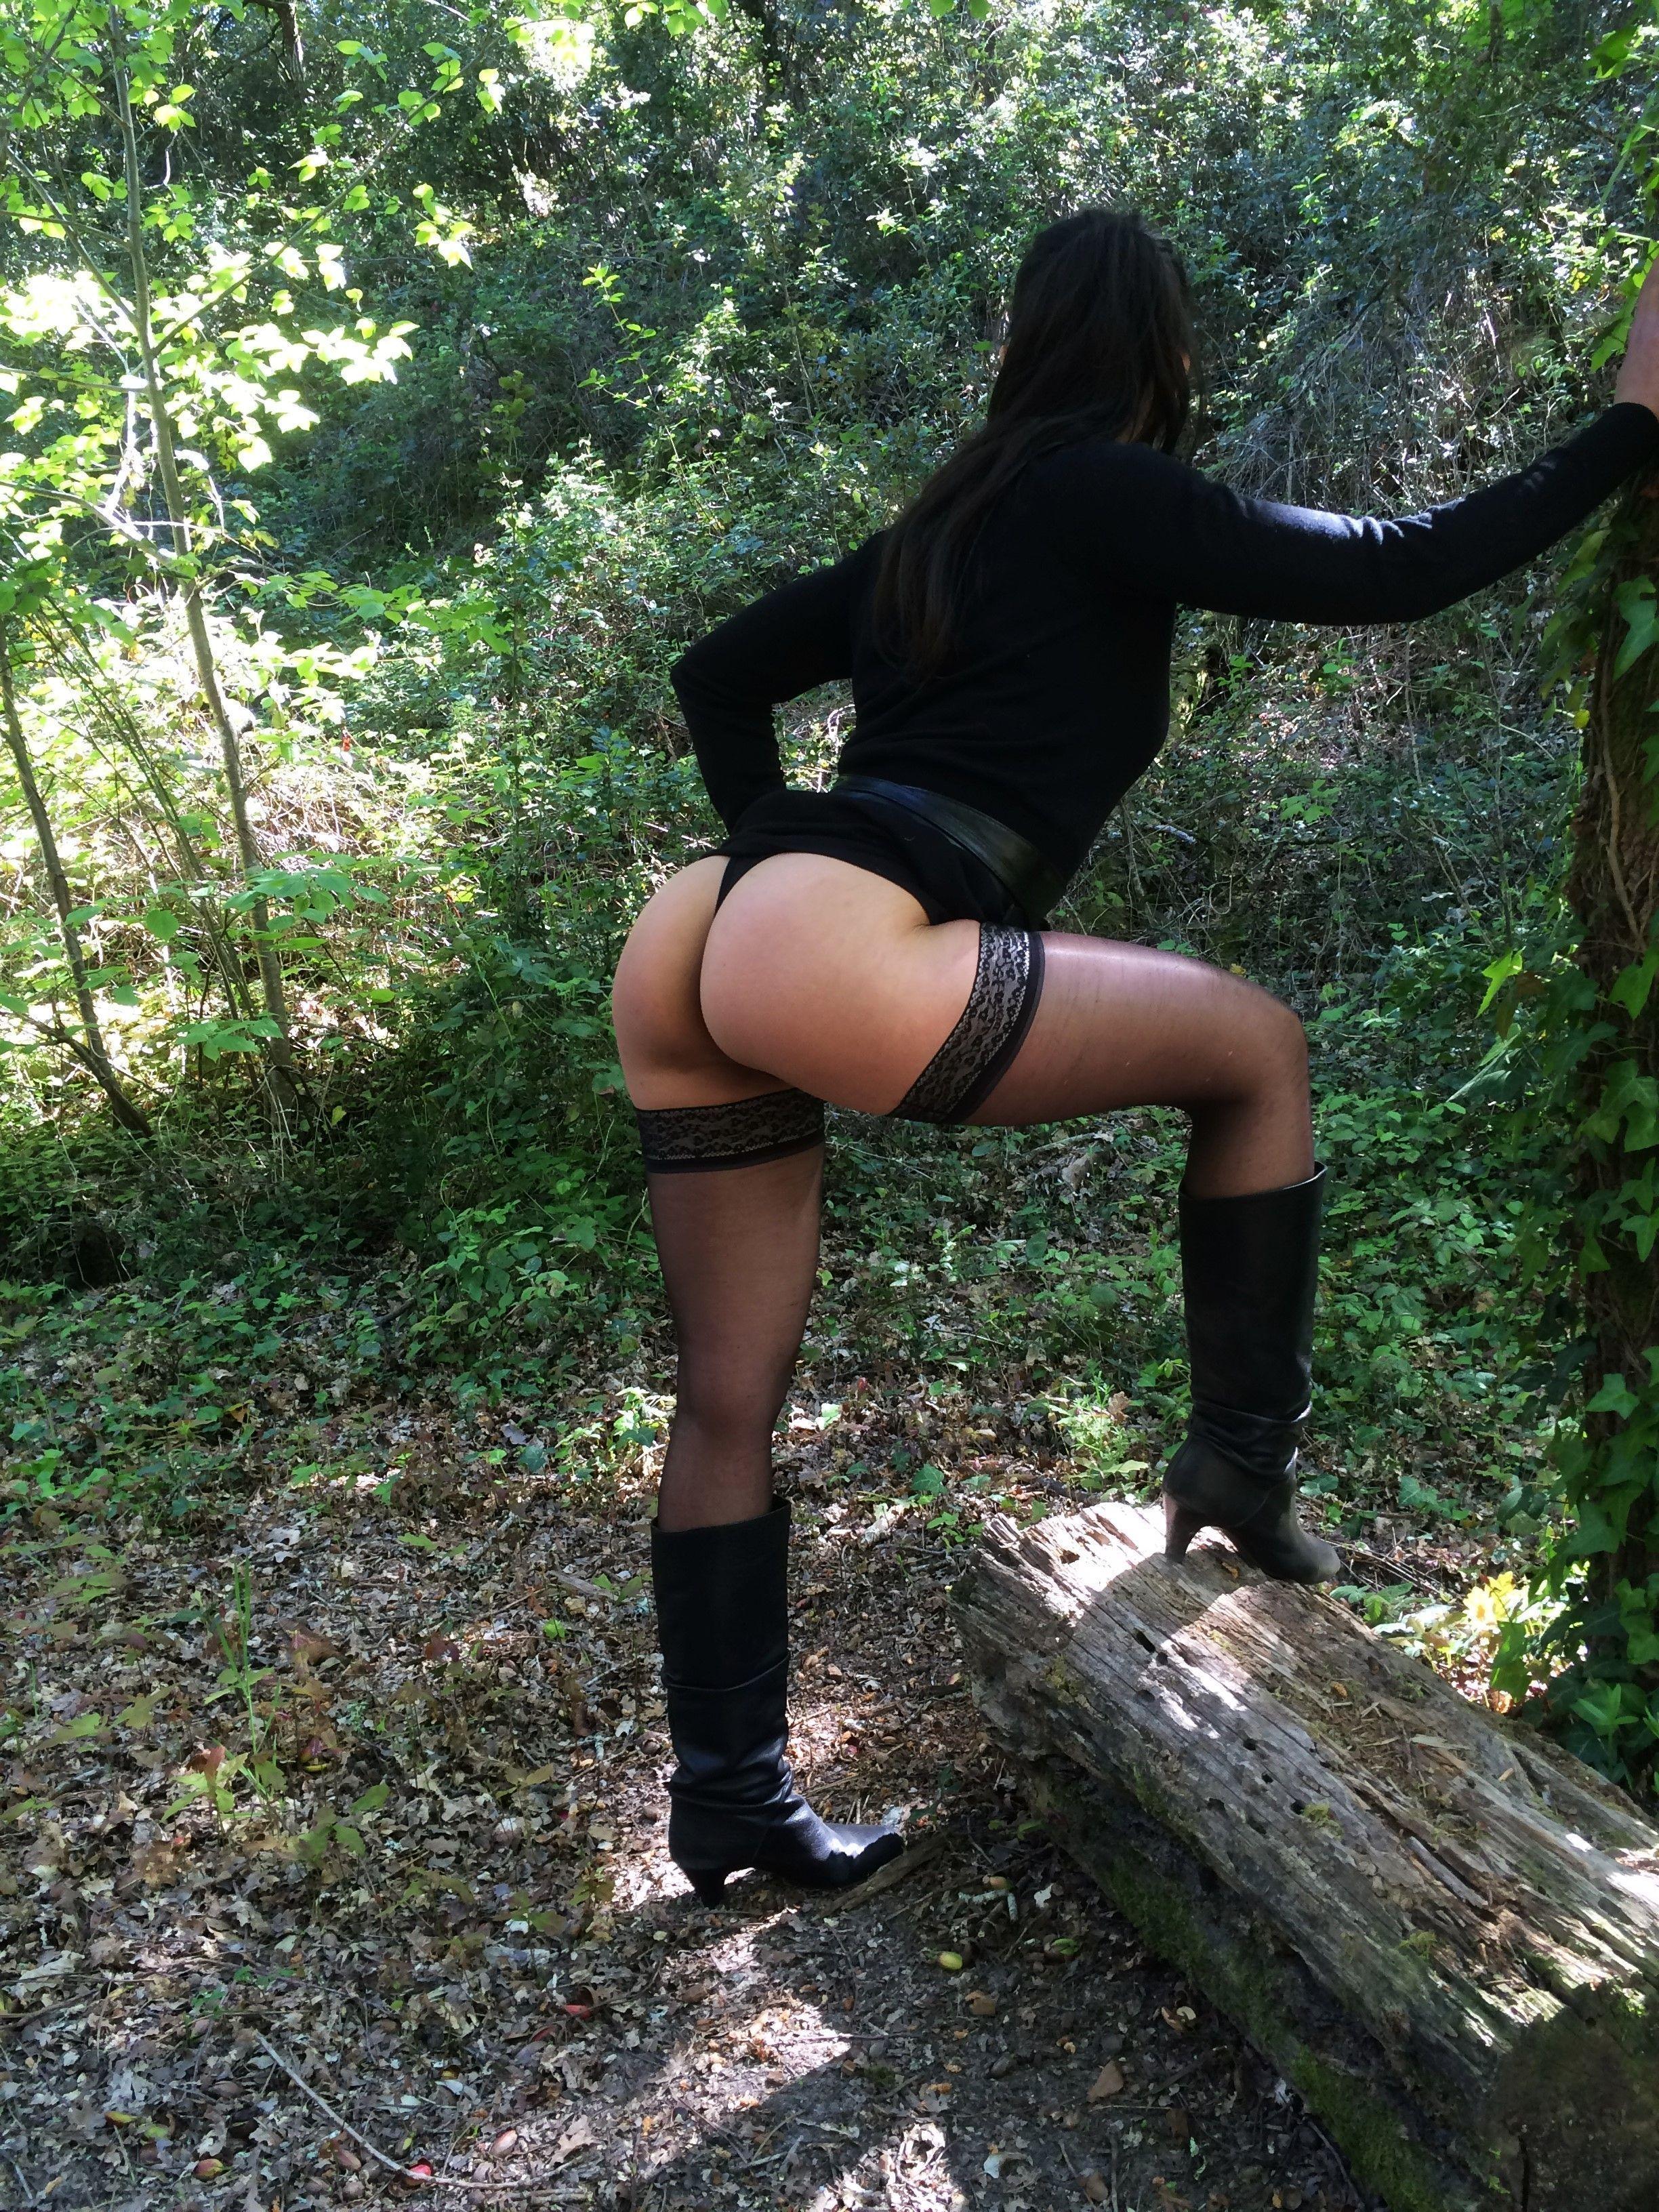 Black milf yasmine de leon shakes her ass for the camera - 1 part 2